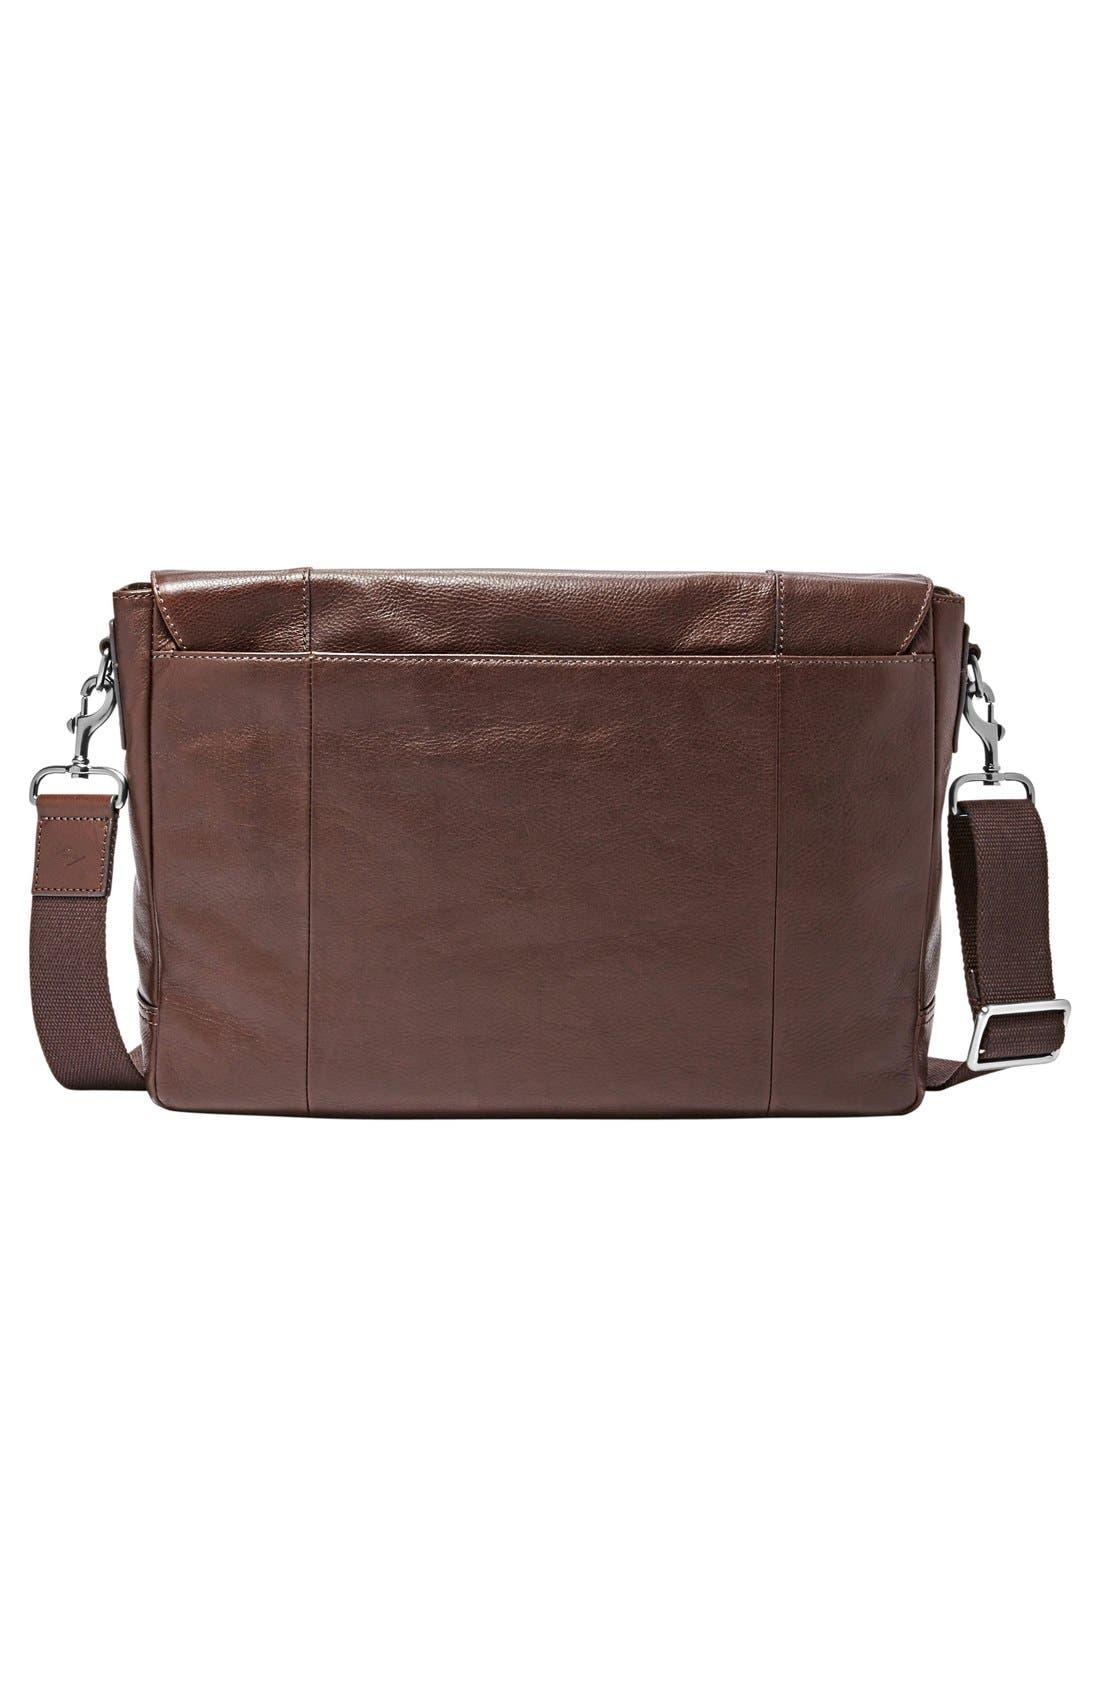 'Graham' Leather Messenger Bag,                             Alternate thumbnail 2, color,                             201